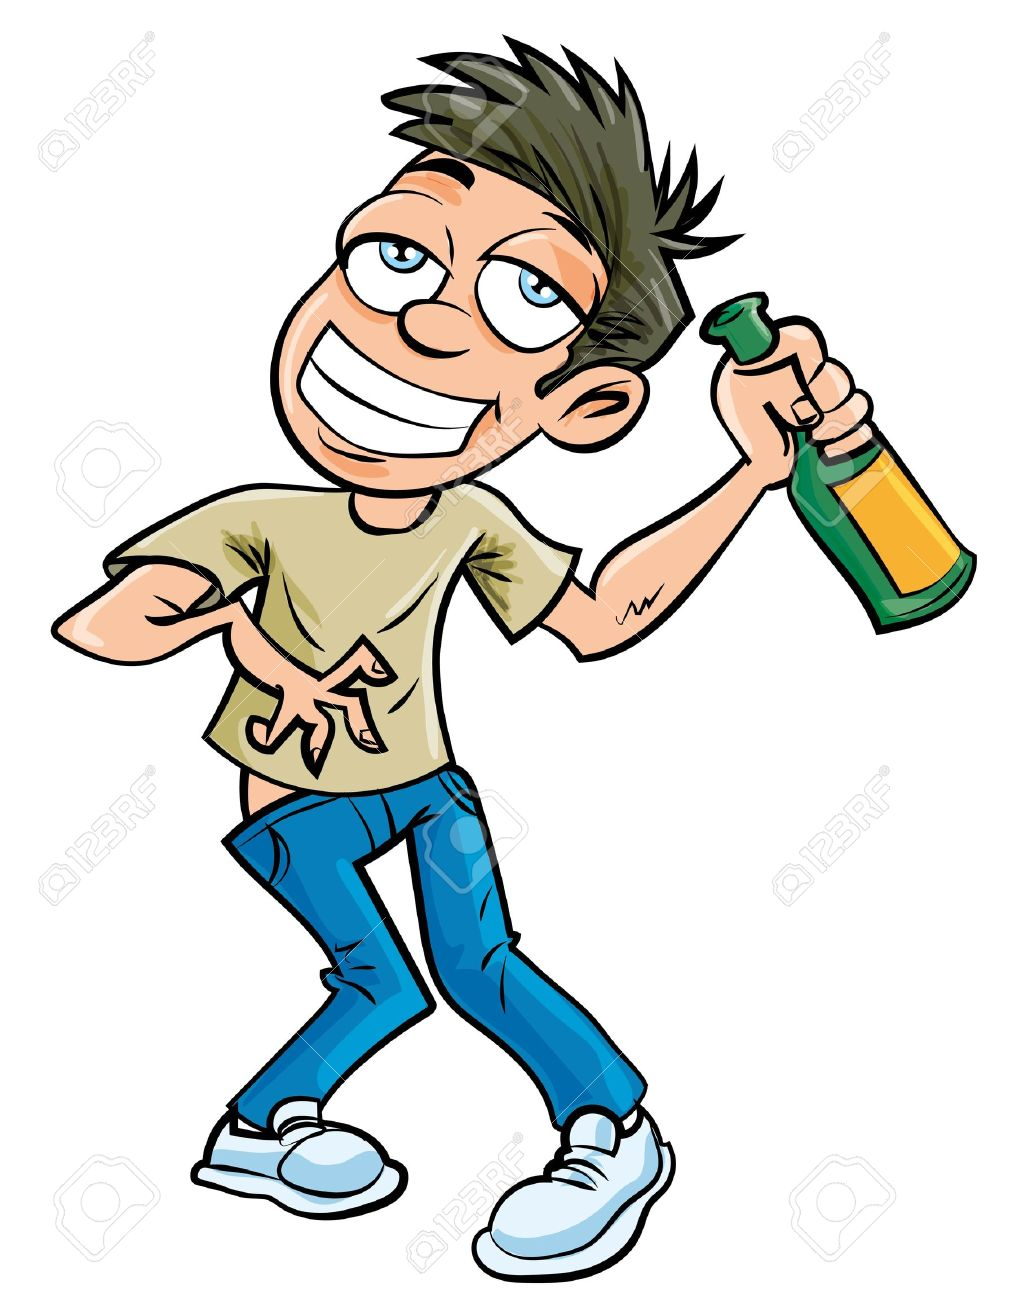 Drunk Person Clipart.